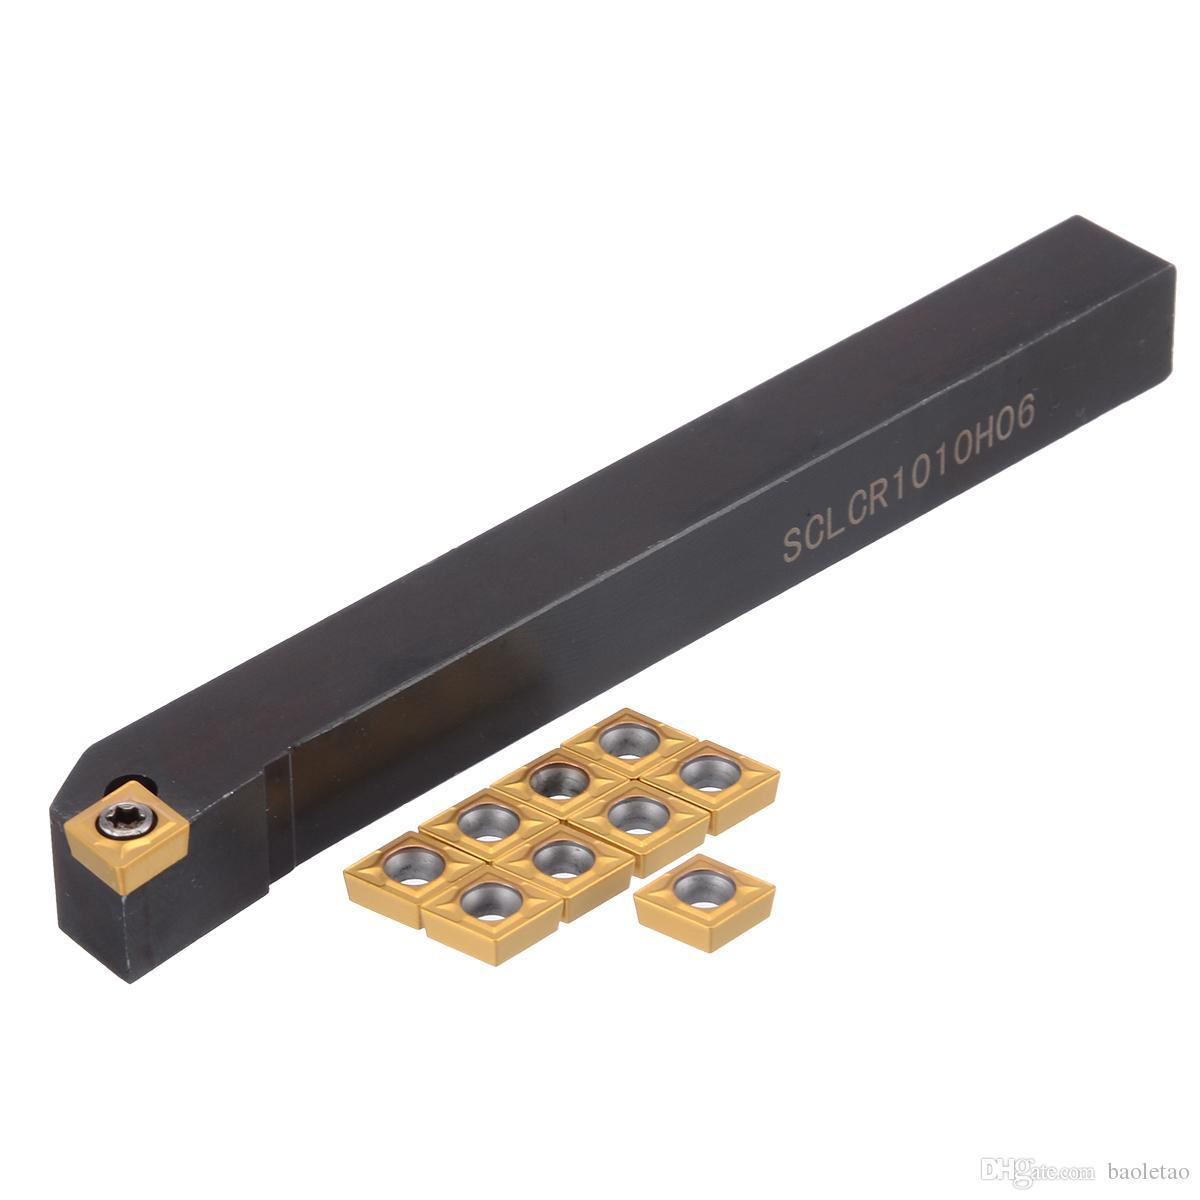 Sclcr1010h06 10x100mm Herramienta Giratoria Torno Soporte 10*Ccmt0602 Insertos